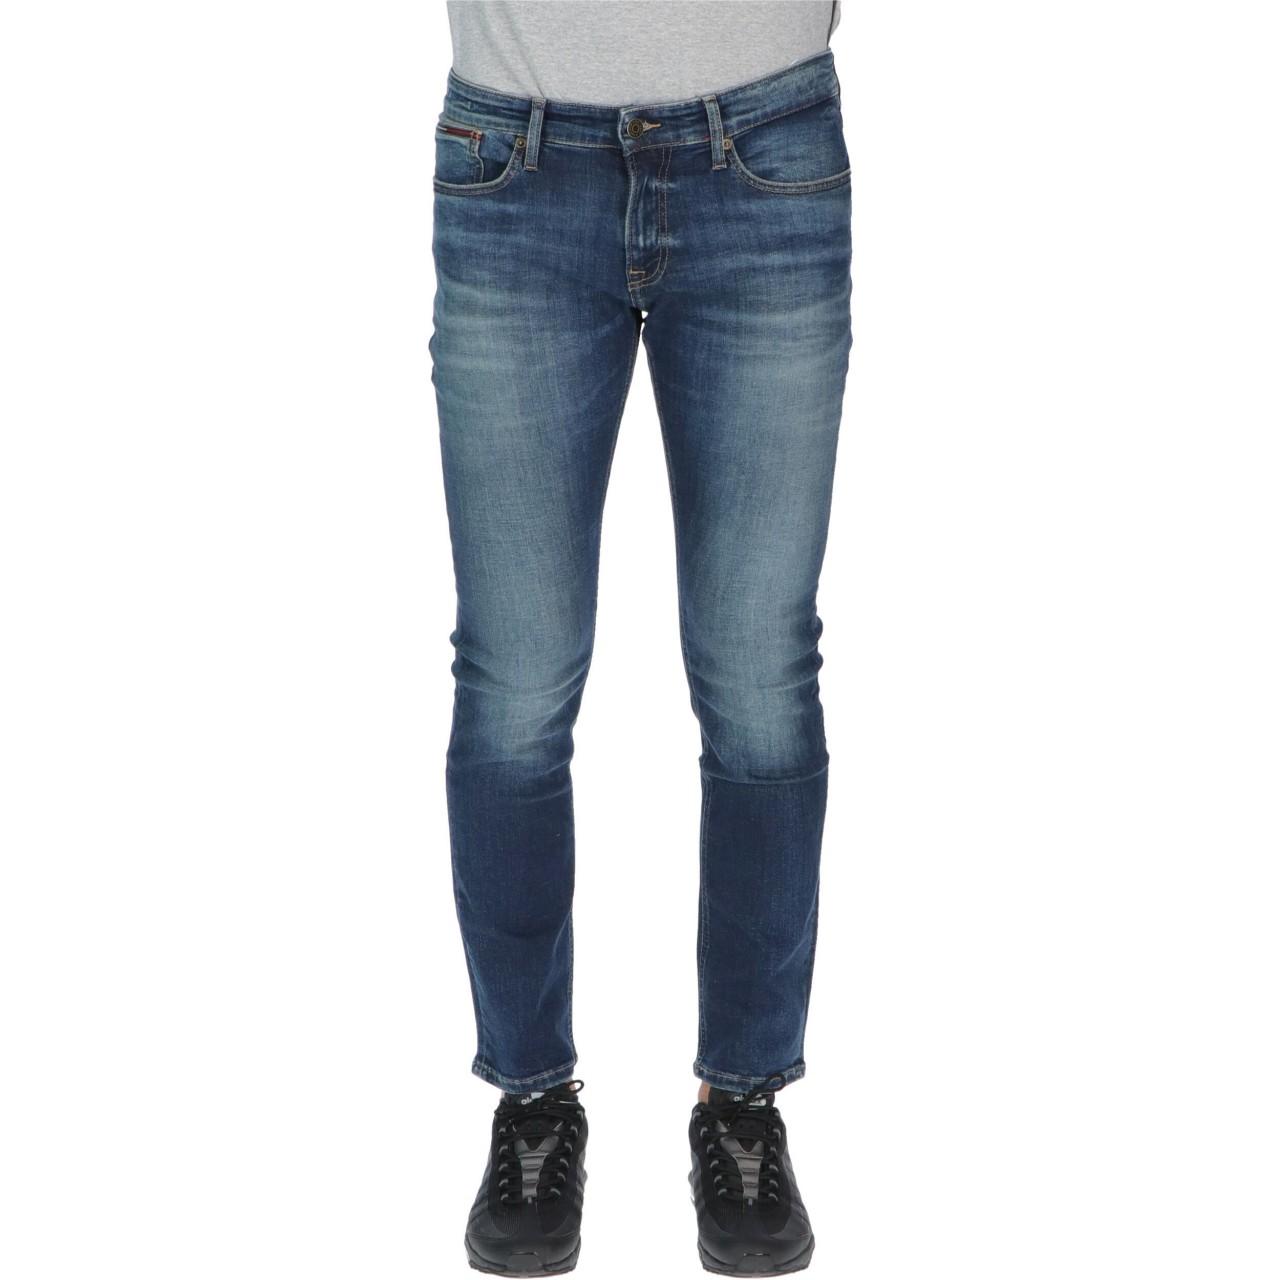 Tommy hilfiger Jeans Tommy Hilfiger Uomo Scanton Dygd 06703M